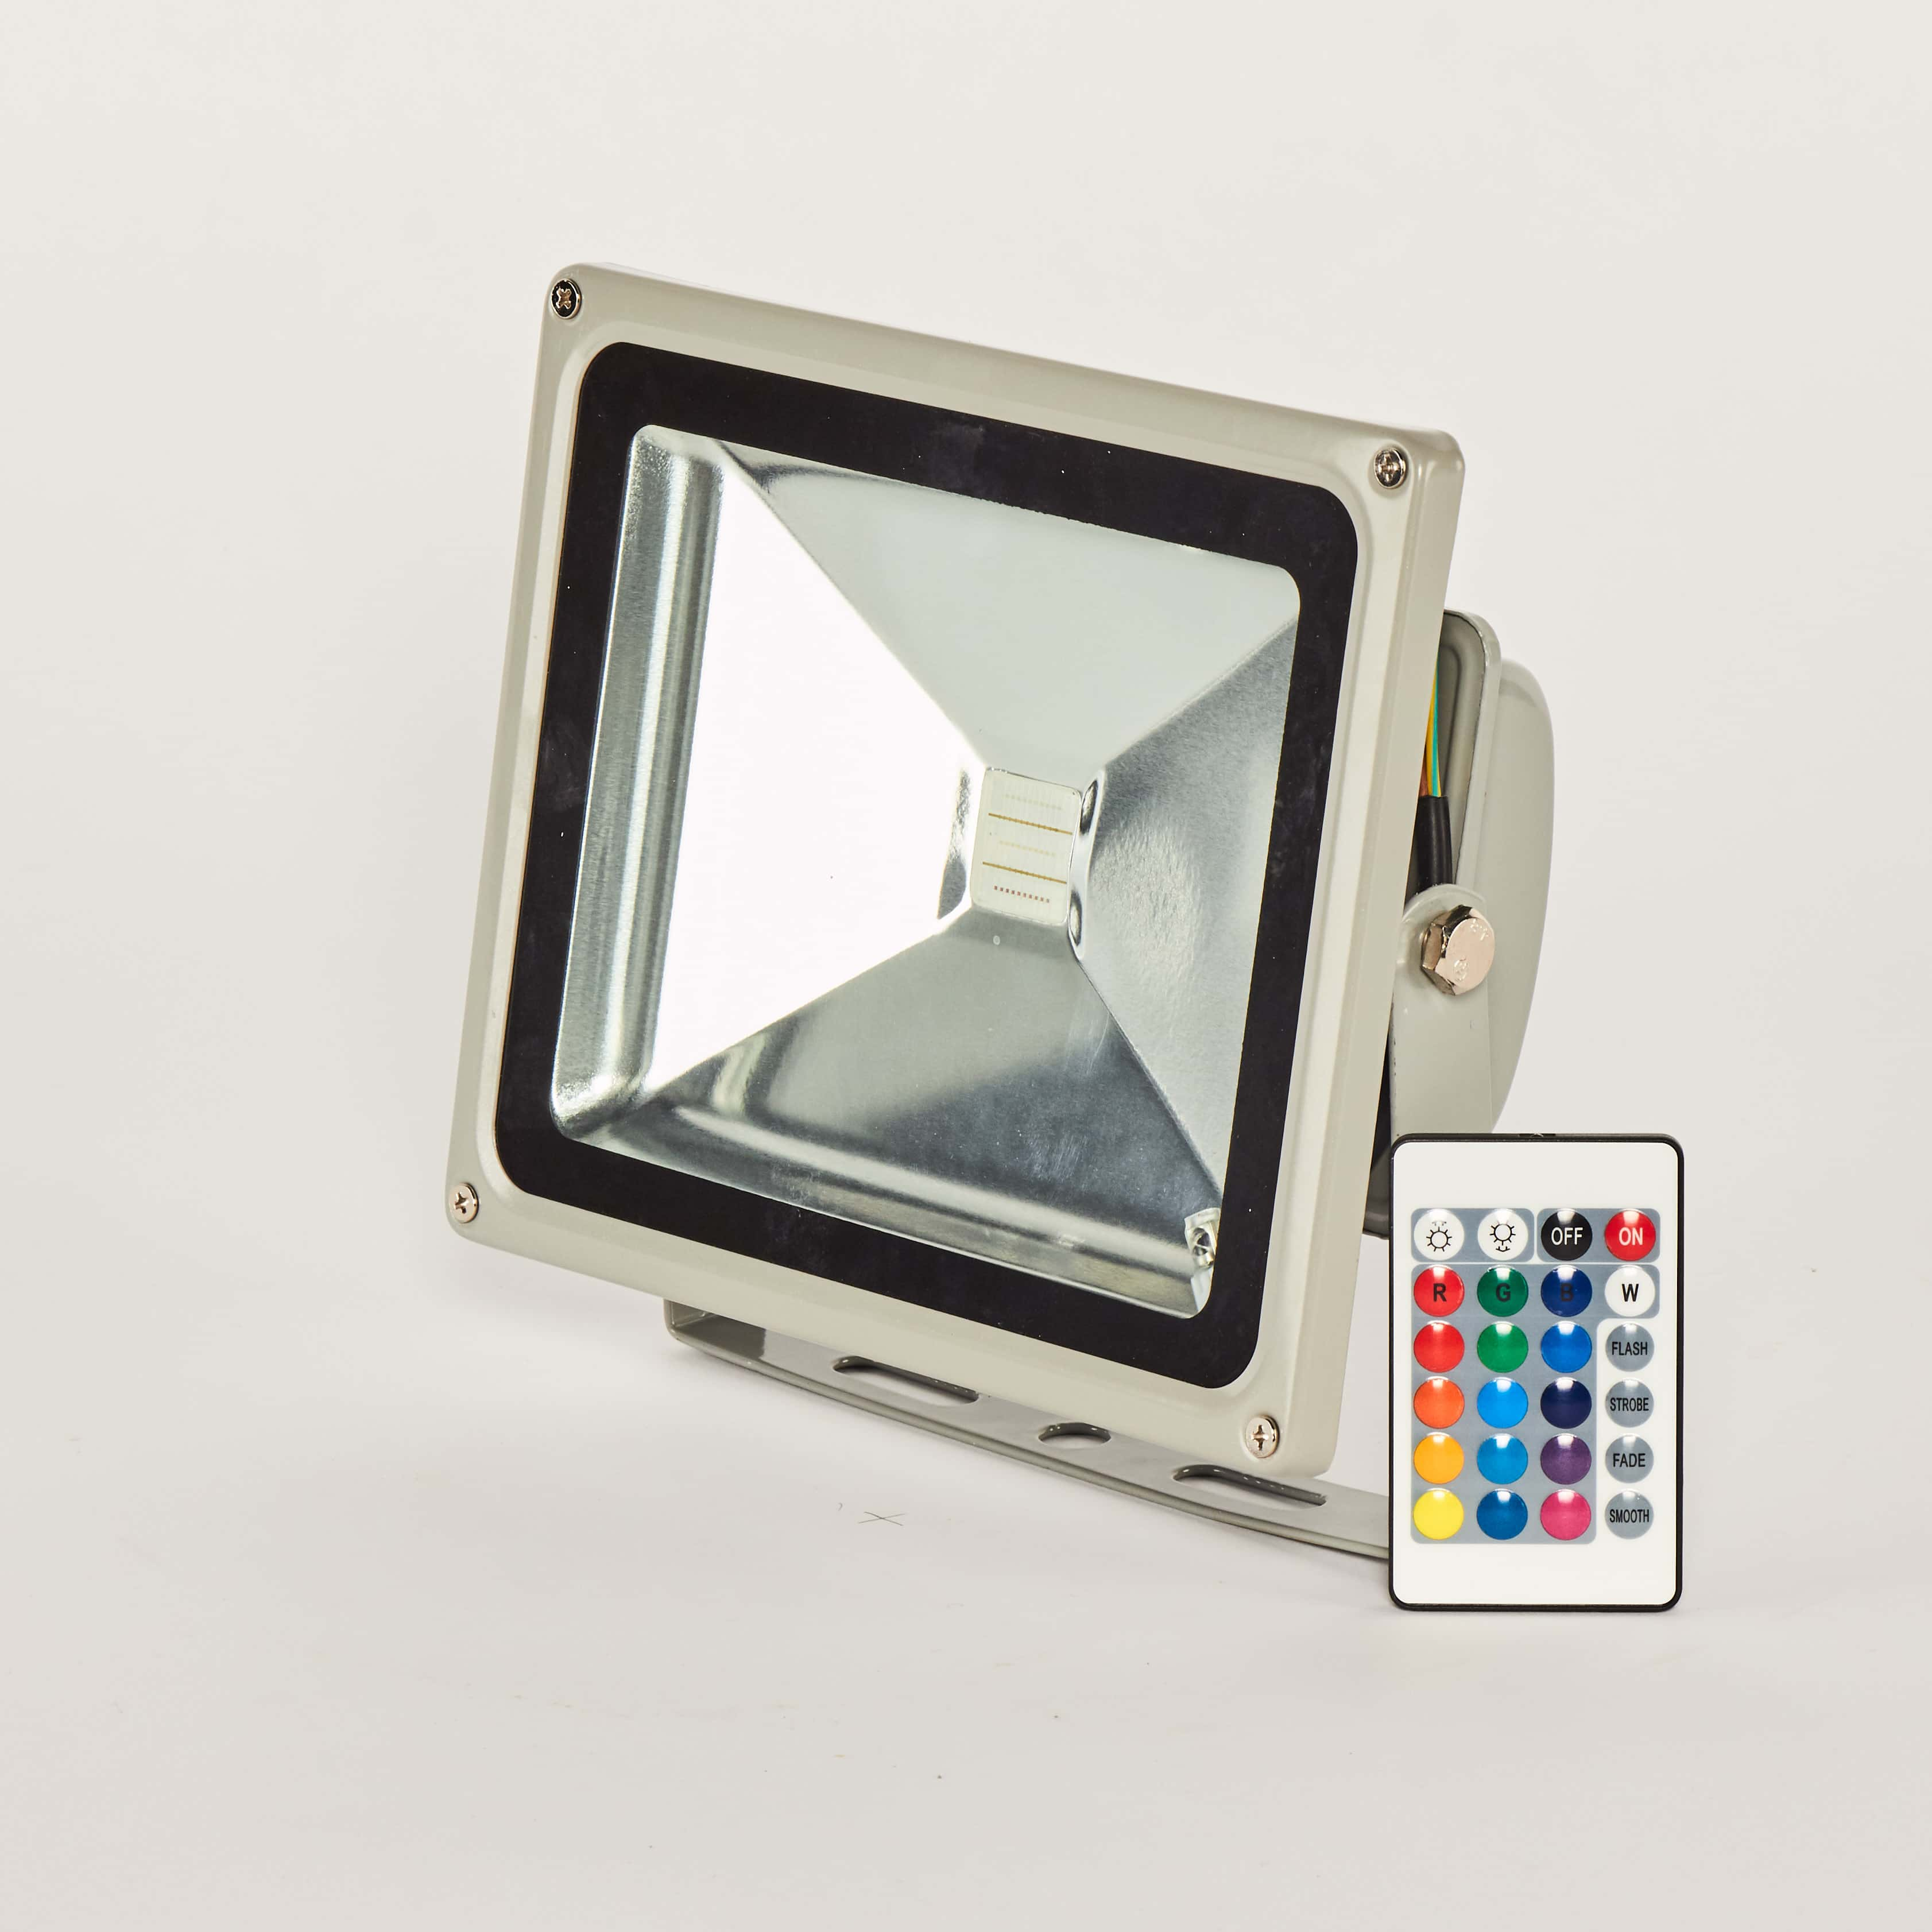 Floodlight 30W RGB voor